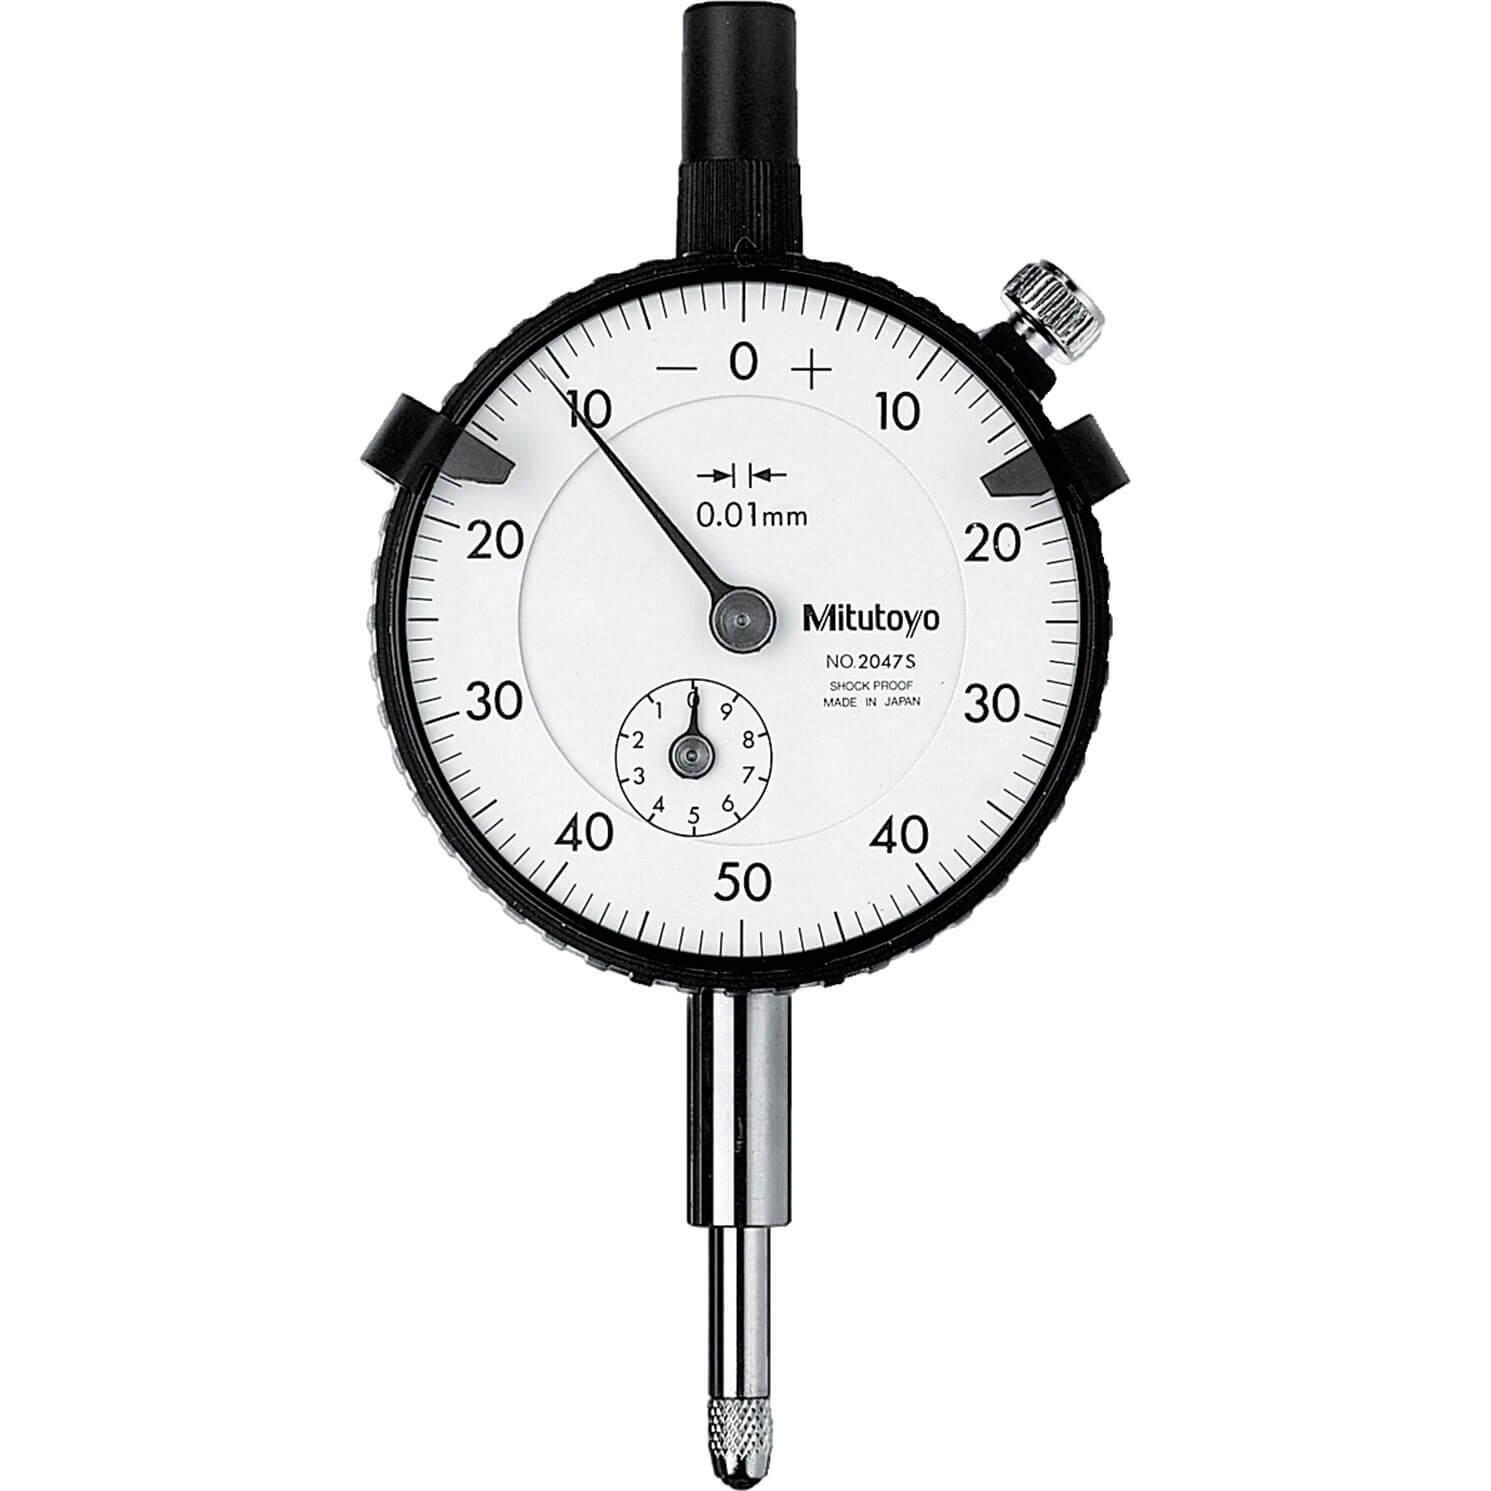 Mitutoyo 2047S Dial Indicator 0.01mm Grad